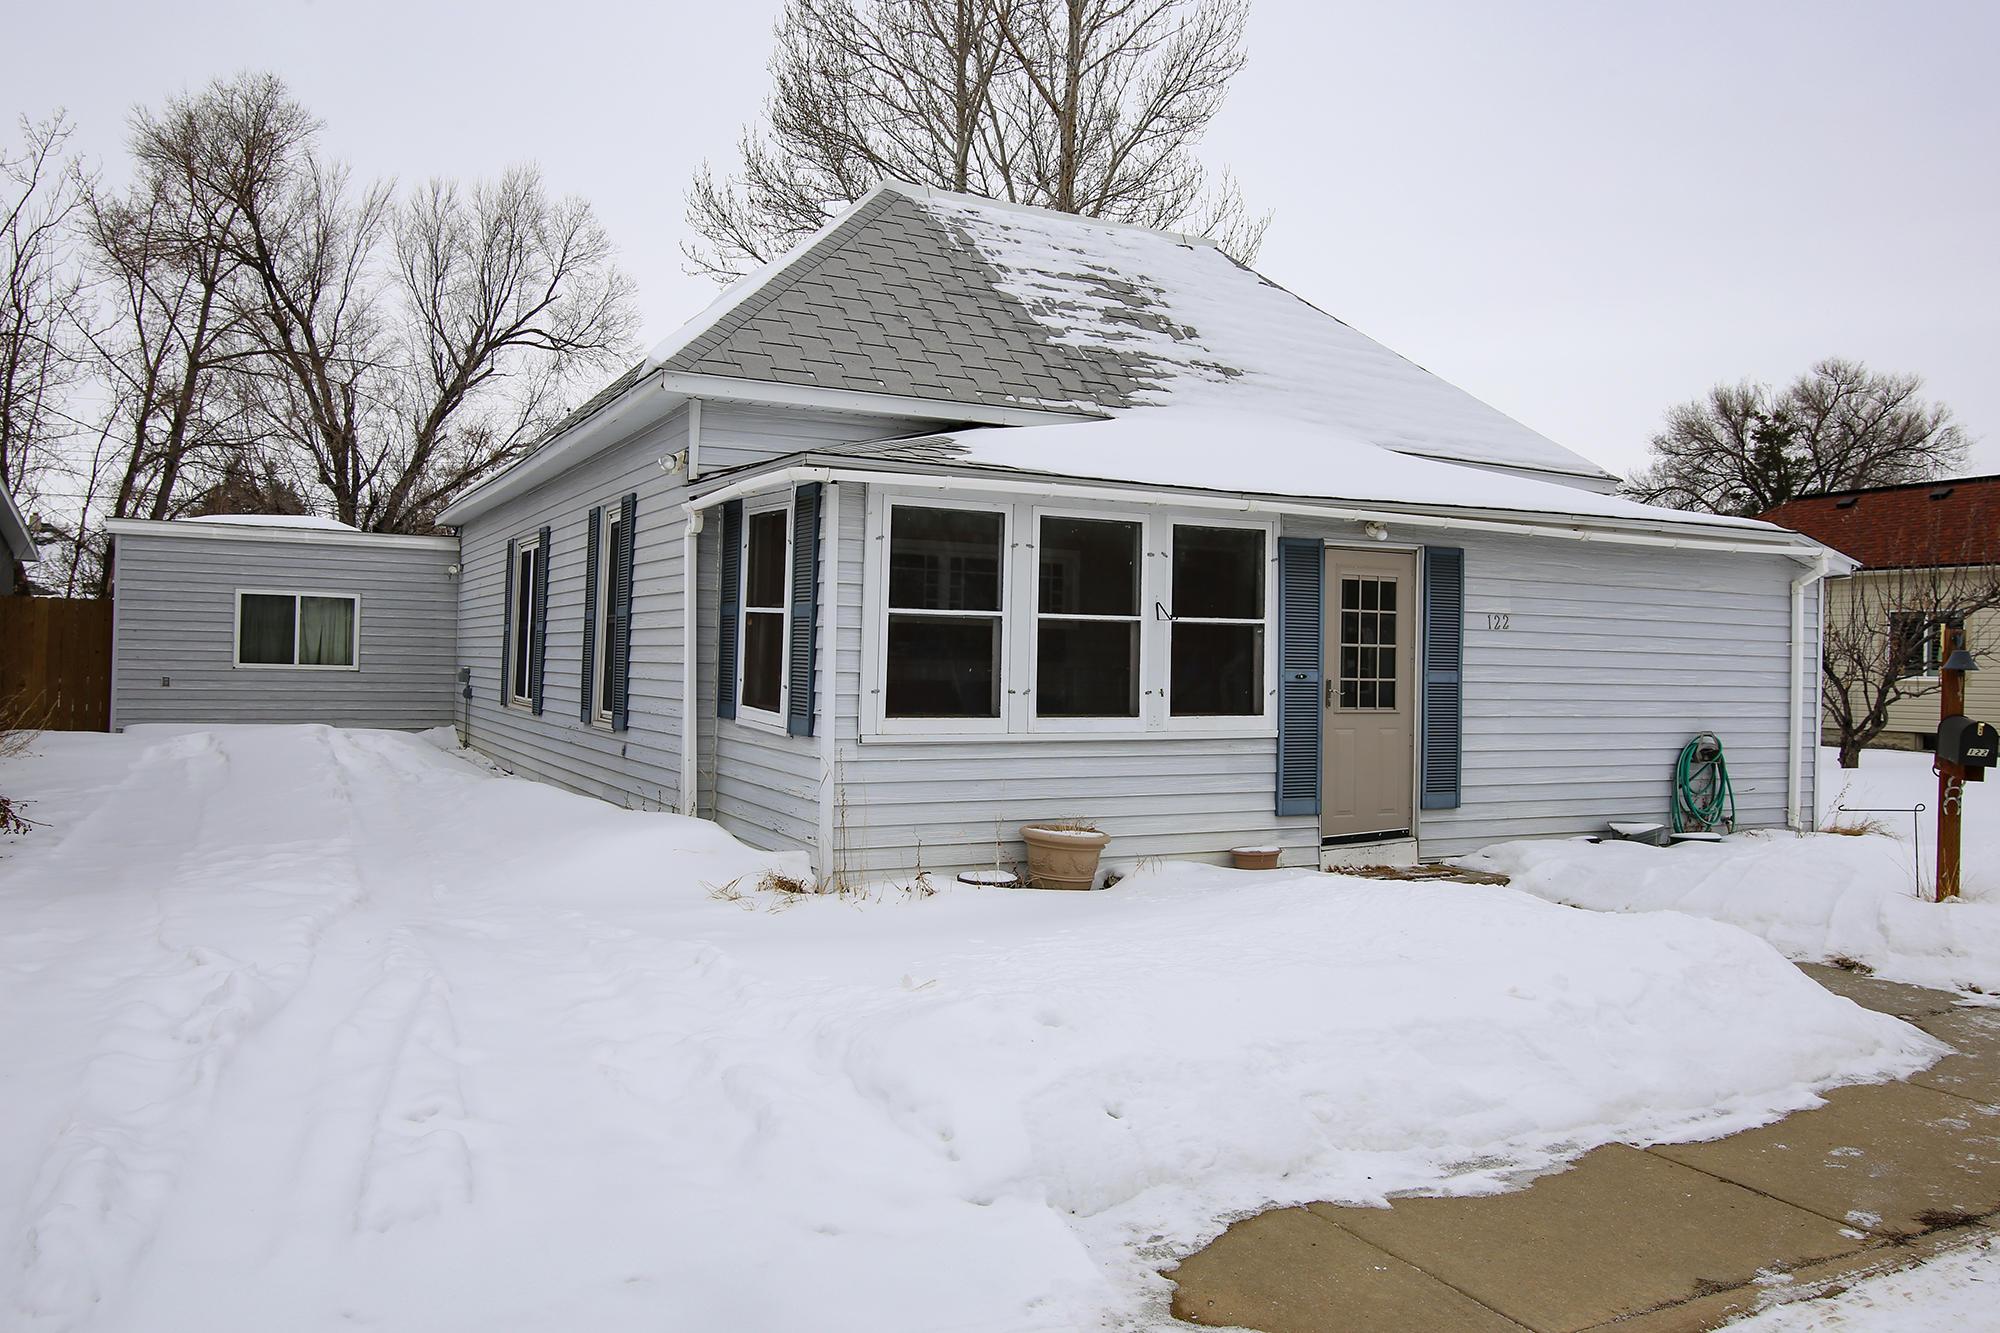 122 E Heald Street, Sheridan, Wyoming 82801, 3 Bedrooms Bedrooms, ,1.5 BathroomsBathrooms,Residential,For Sale,Heald,19-197